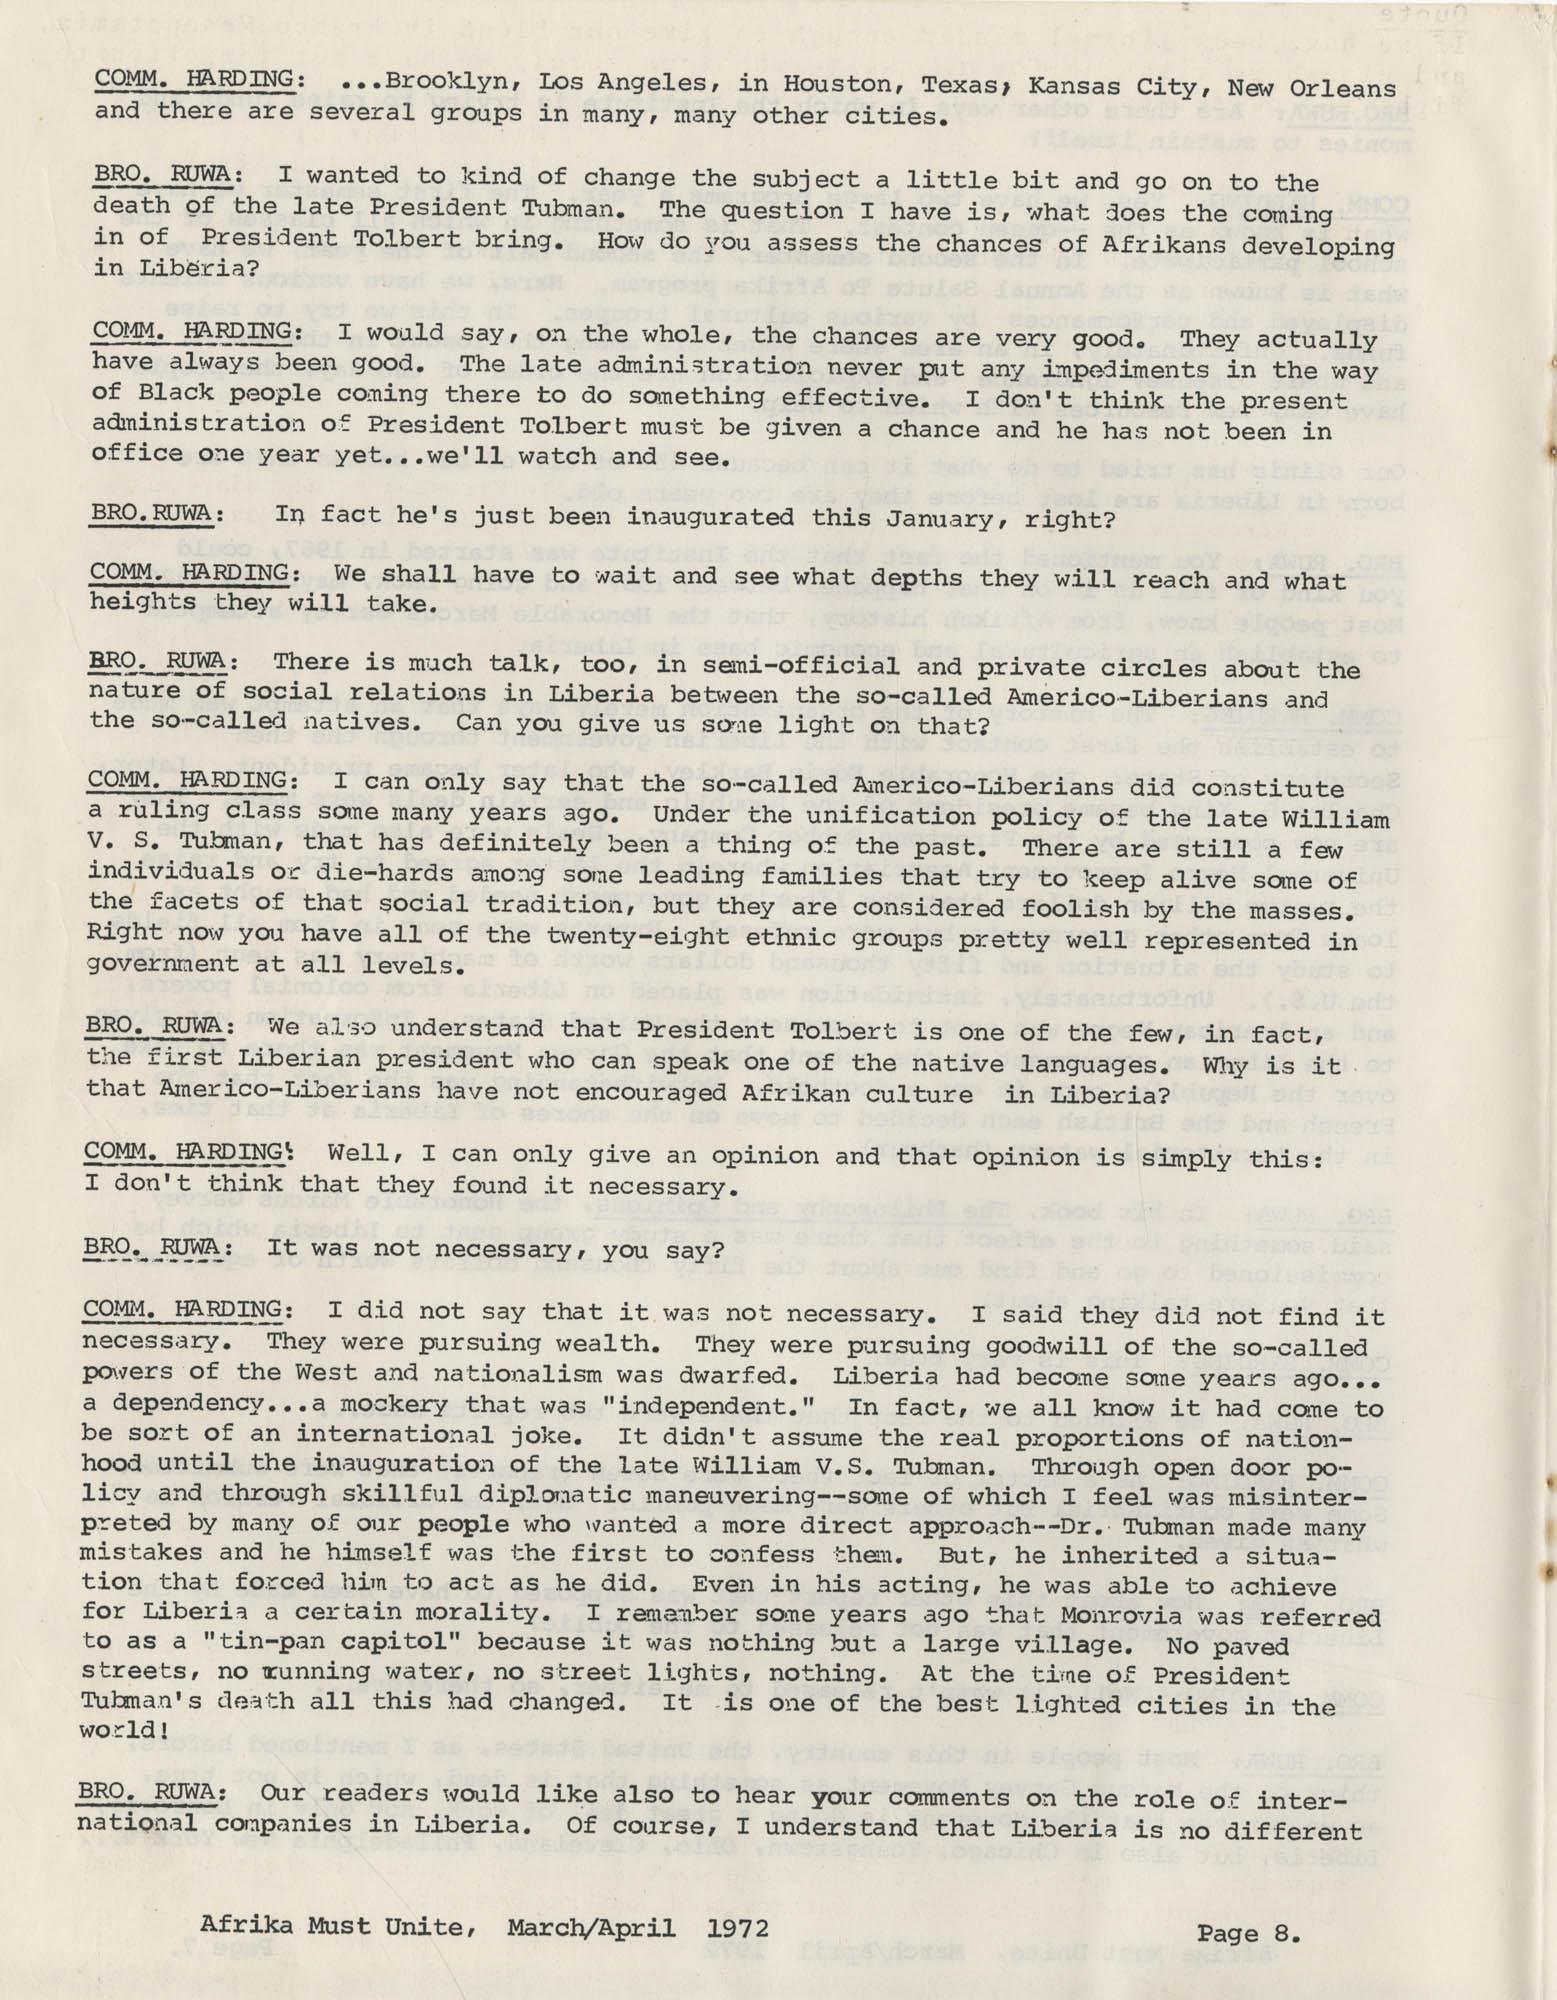 Afrika Must Unite, Vol. 1, No. 4, Page 8